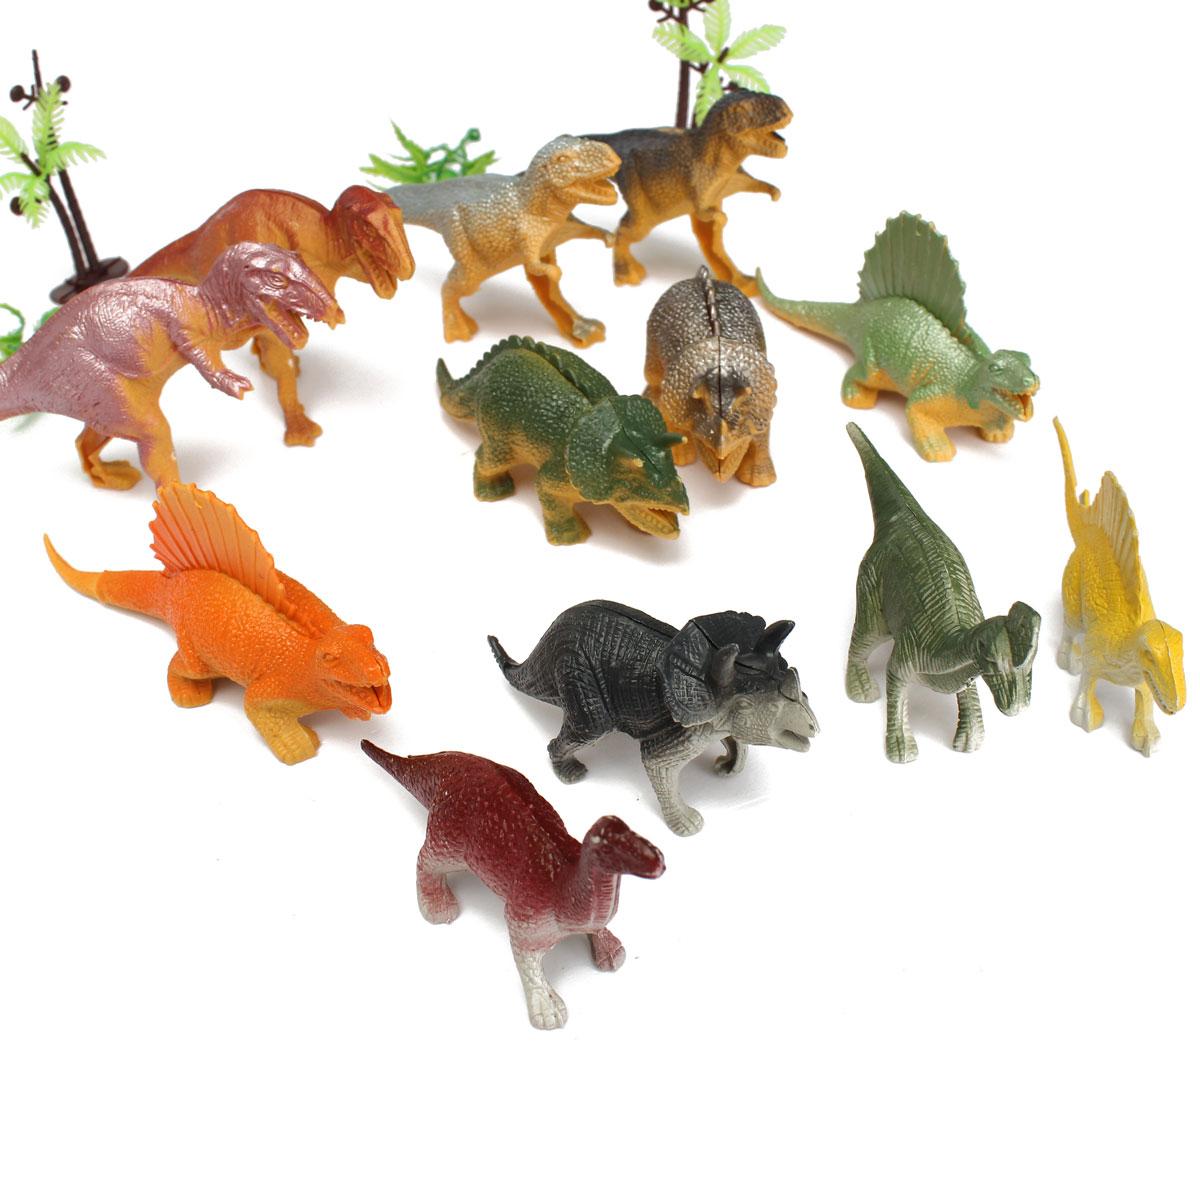 12PCS Mixed Dinosaur Toys Playset Christmas Stocking Filler Party Gift Figures - Photo: 5